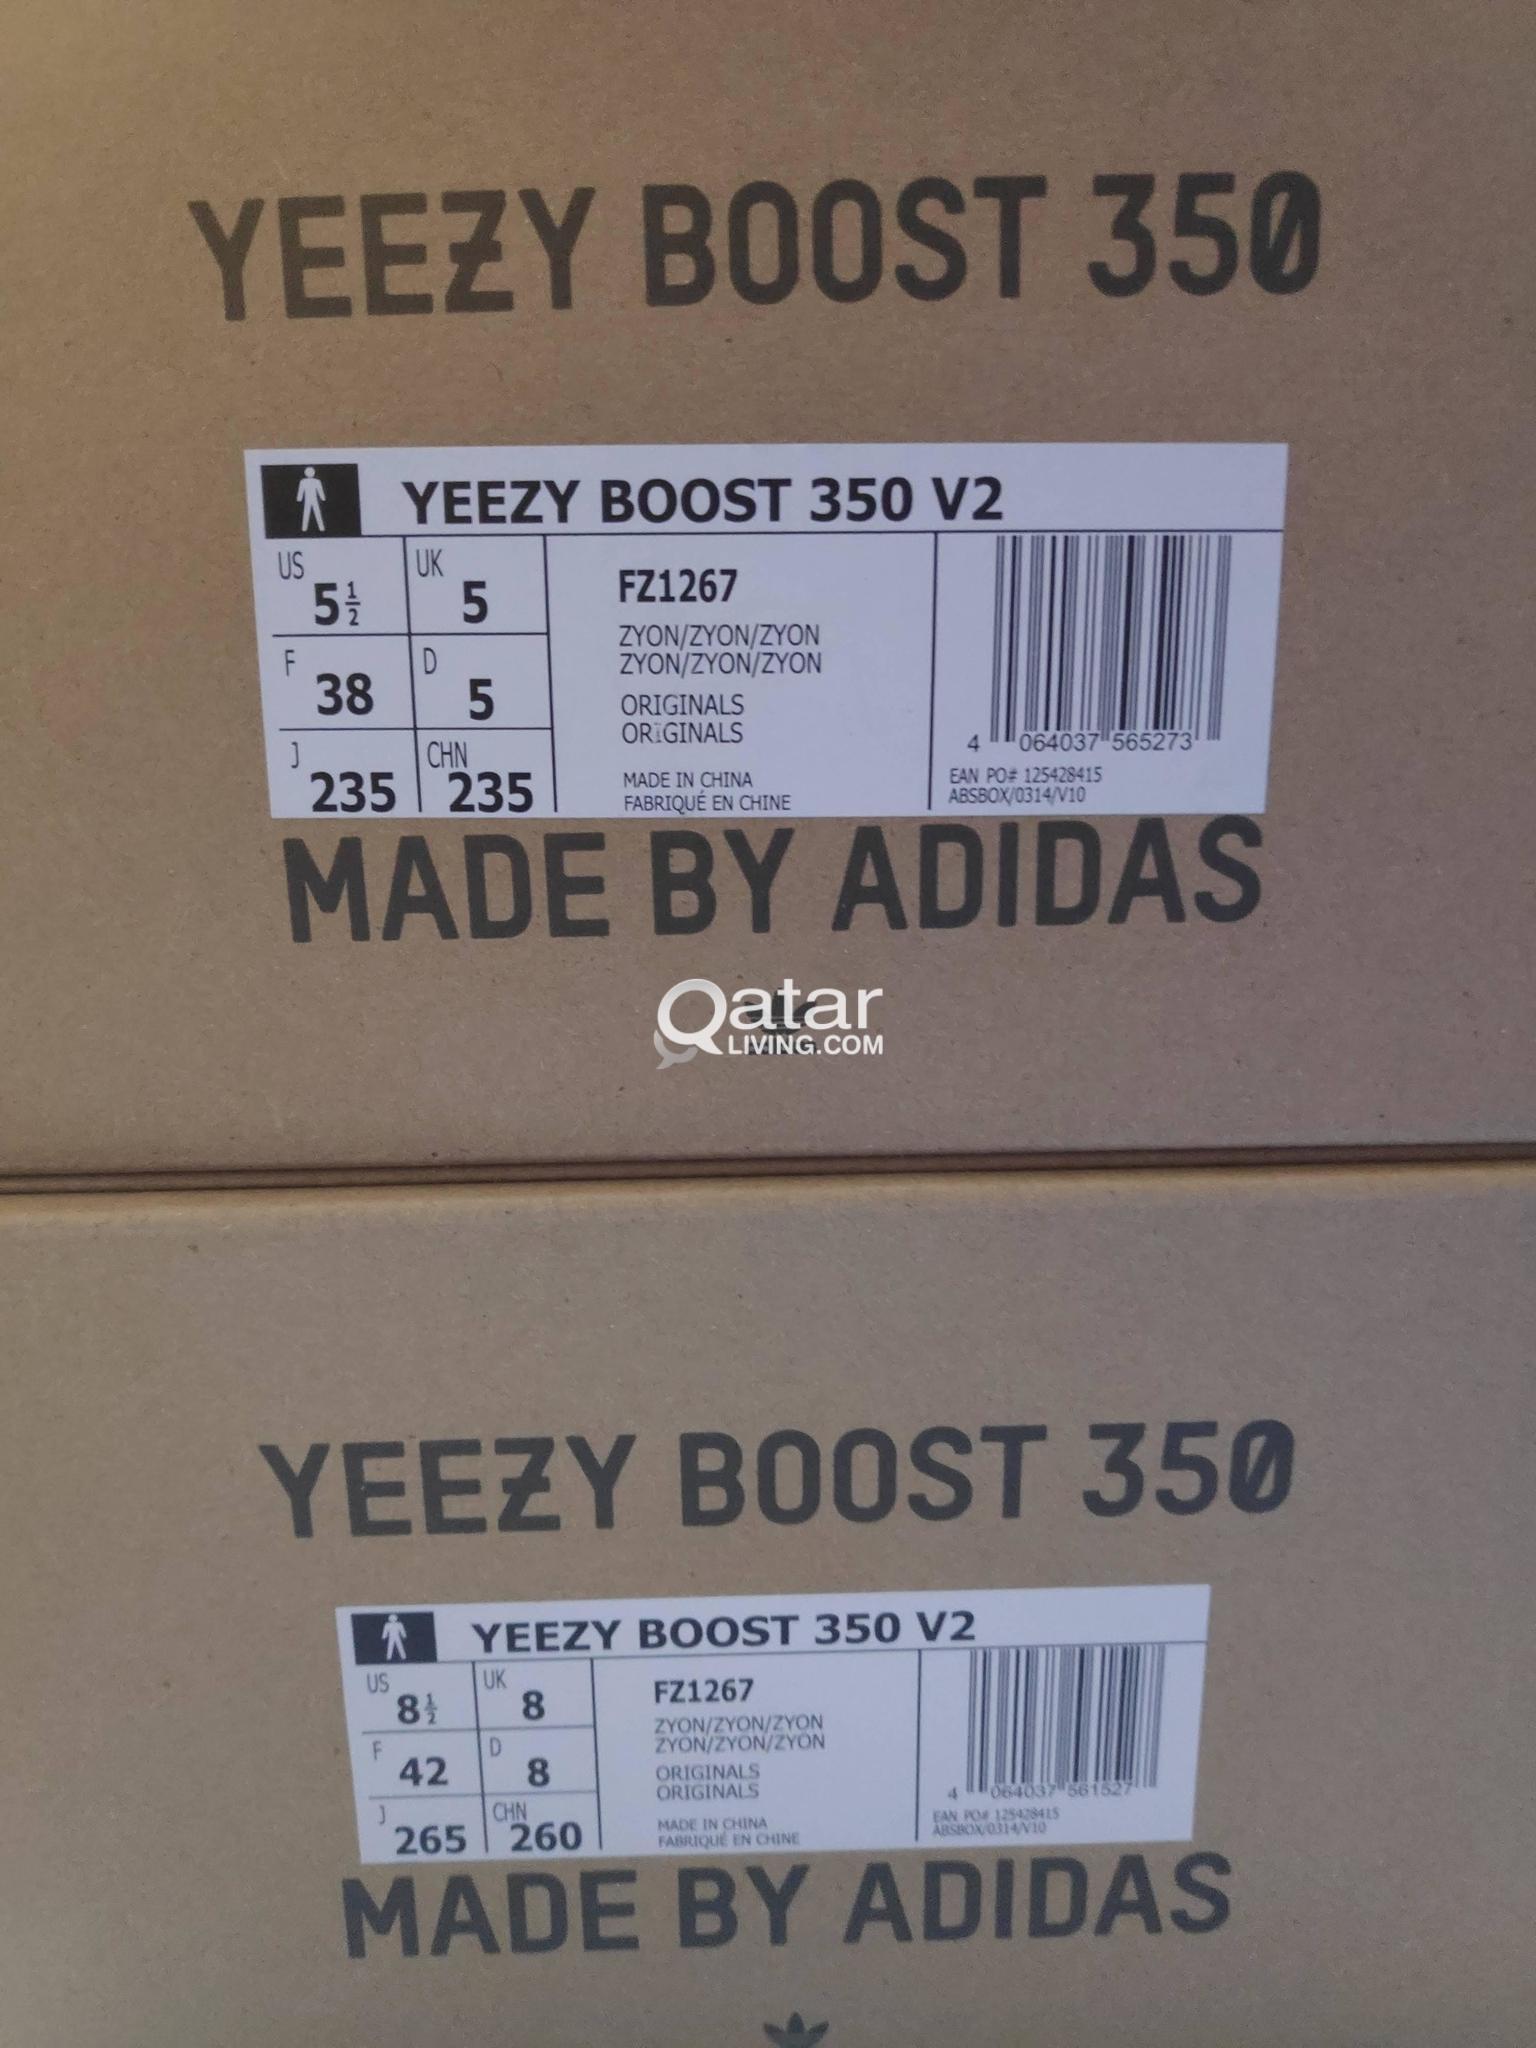 Yeezy boost 350 v2 ZYON  US 5.5 size 38